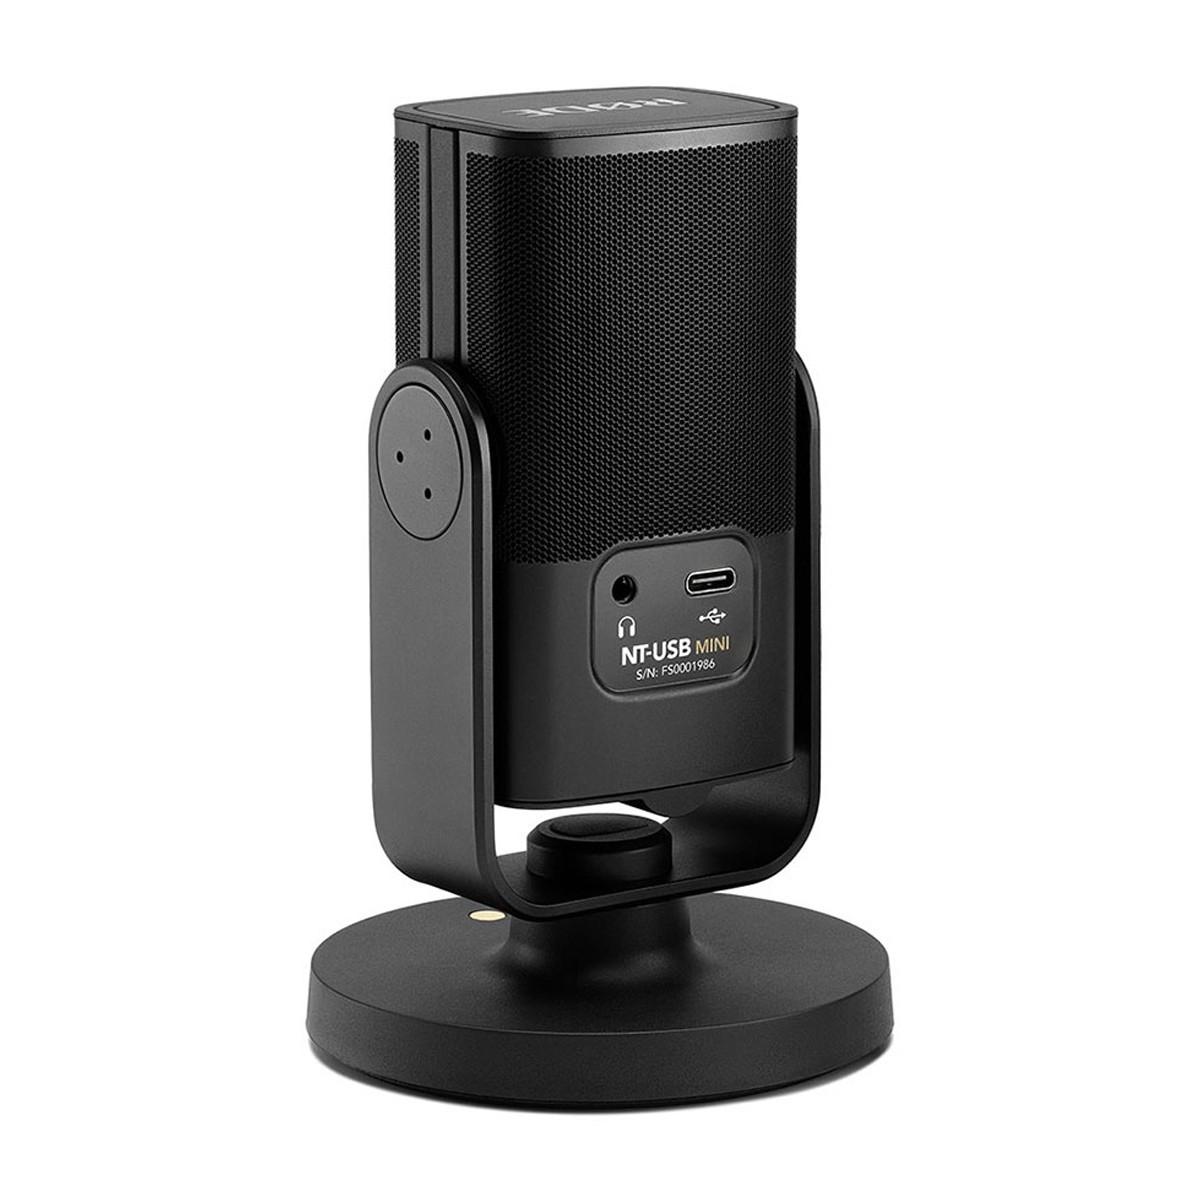 Microfone USB p/ Live, Gravação e Streaming Rode NT-USB MINI